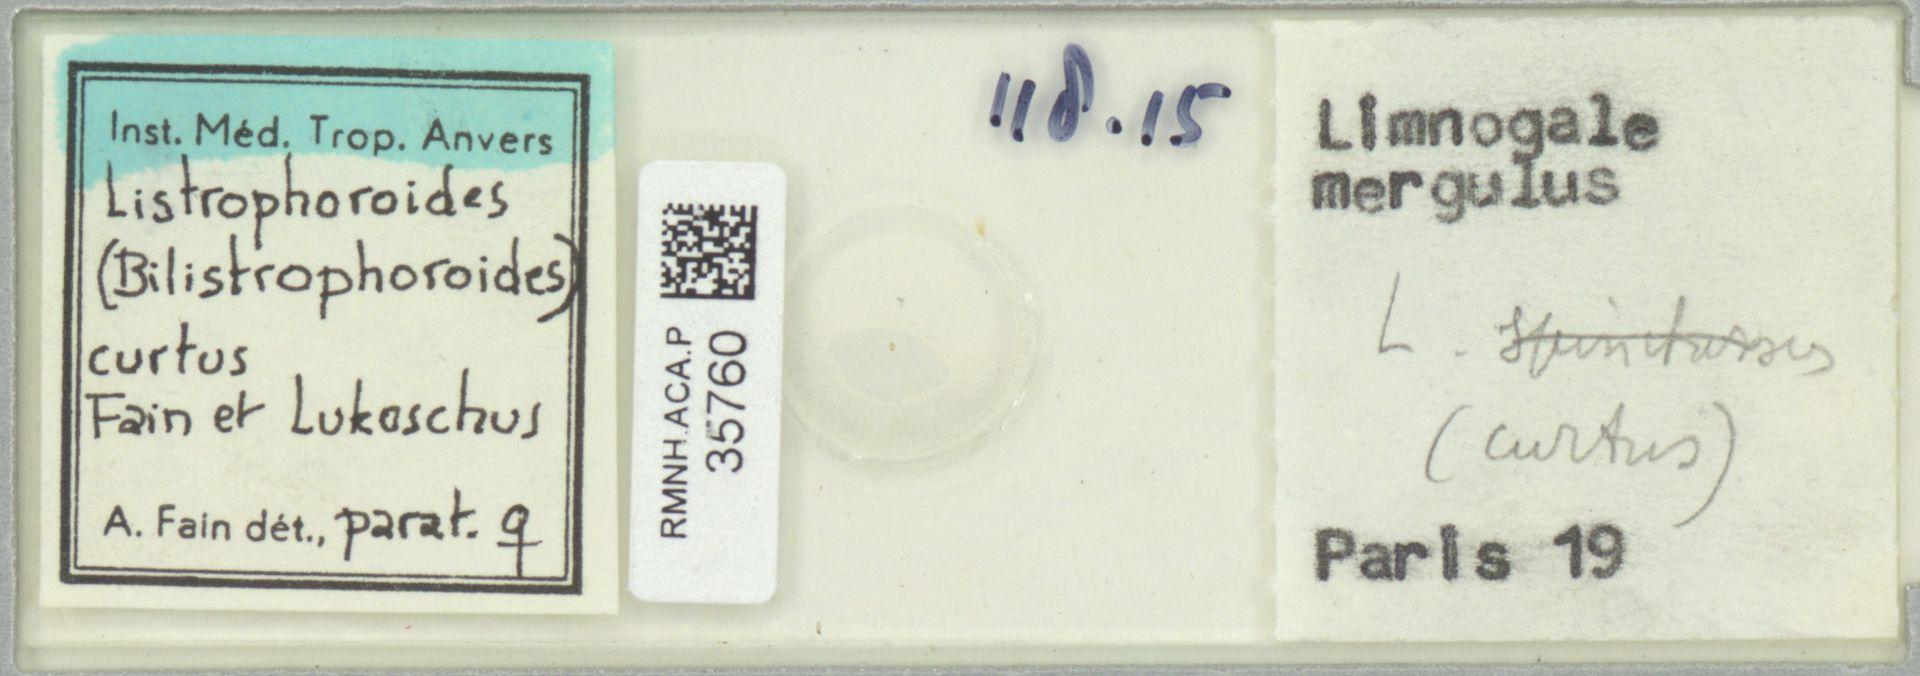 RMNH.ACA.P.35760 | Listrophoroides (Bilistrophoroides) curtus Fain et Lukoschus